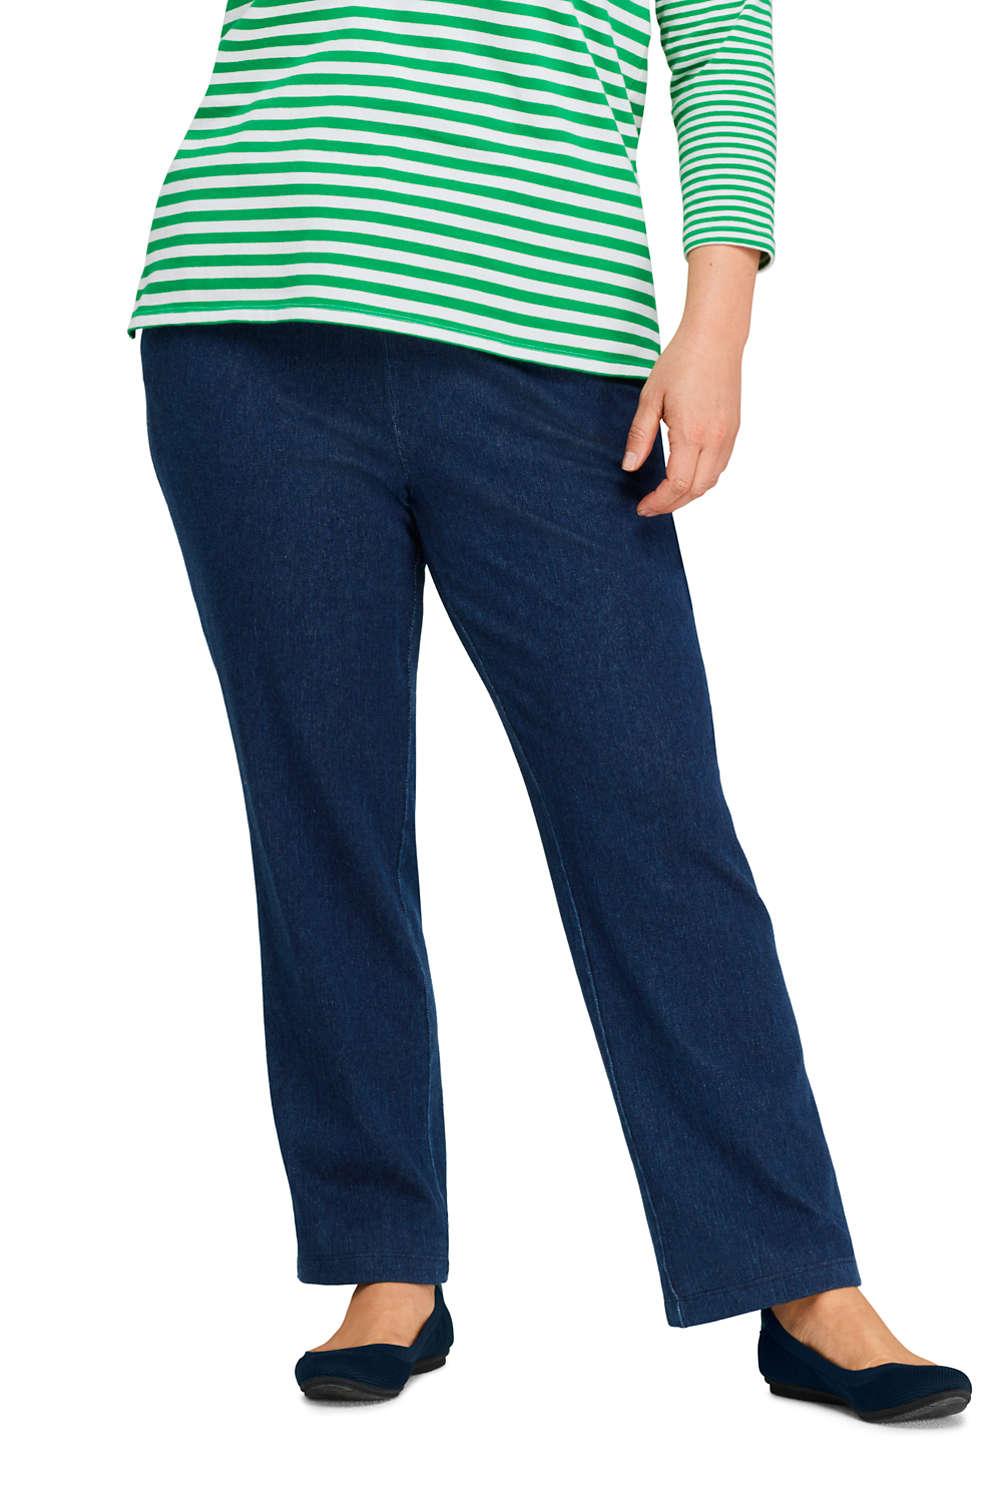 7e9fb705cb7 Women s Plus Size Sport Knit Elastic Waist Pants High Rise Denim. Item   435236AH2. View Fullscreen